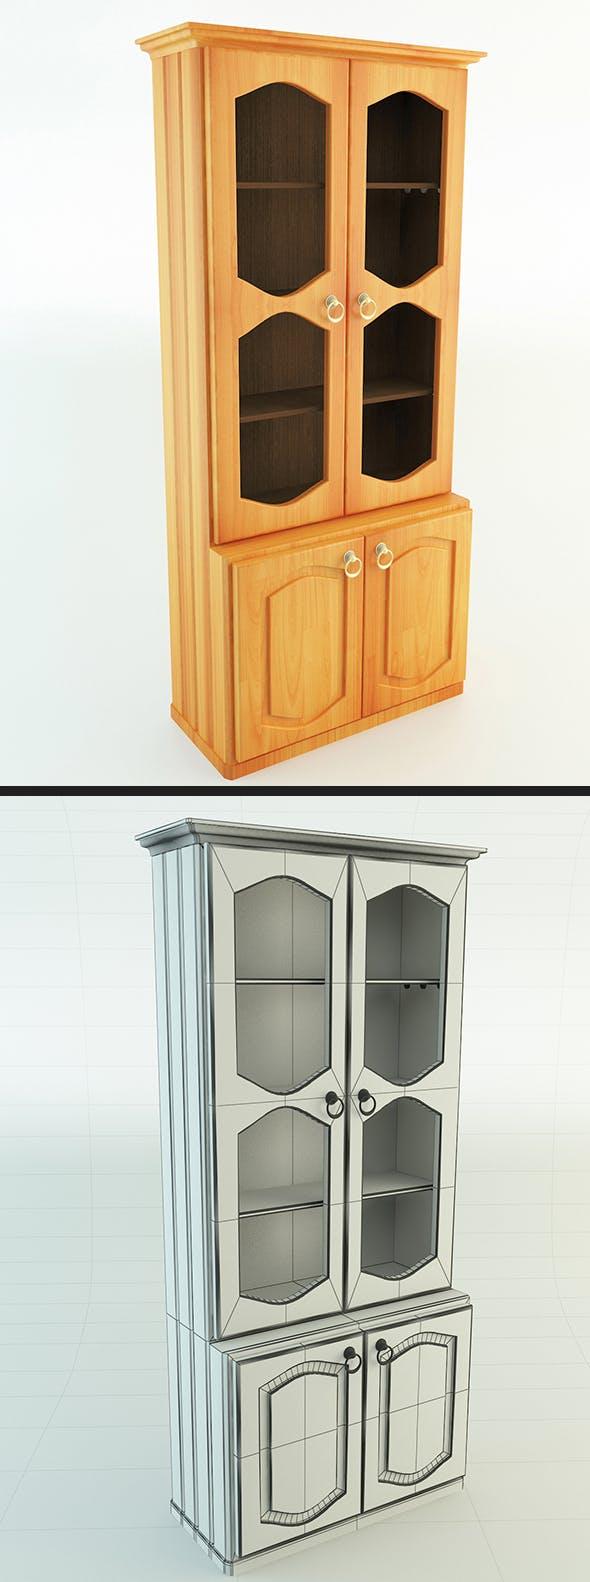 Display Cabinet - 3DOcean Item for Sale